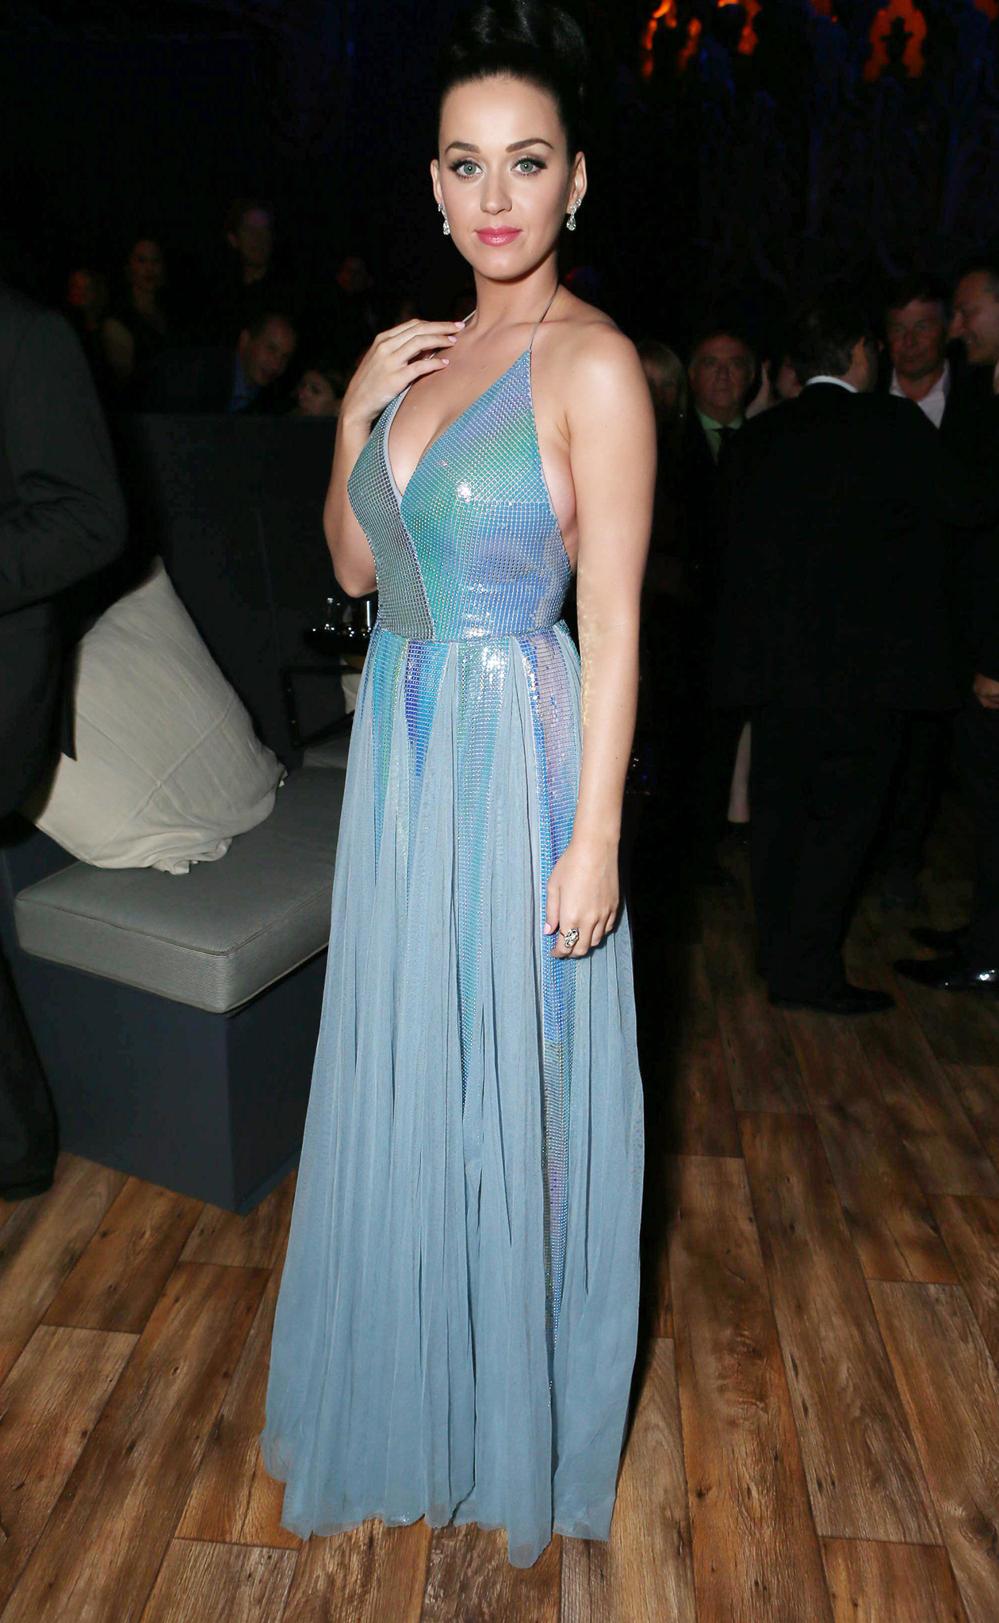 Check Out Katy Perry's Dress @katyperry « TeenInfoNet